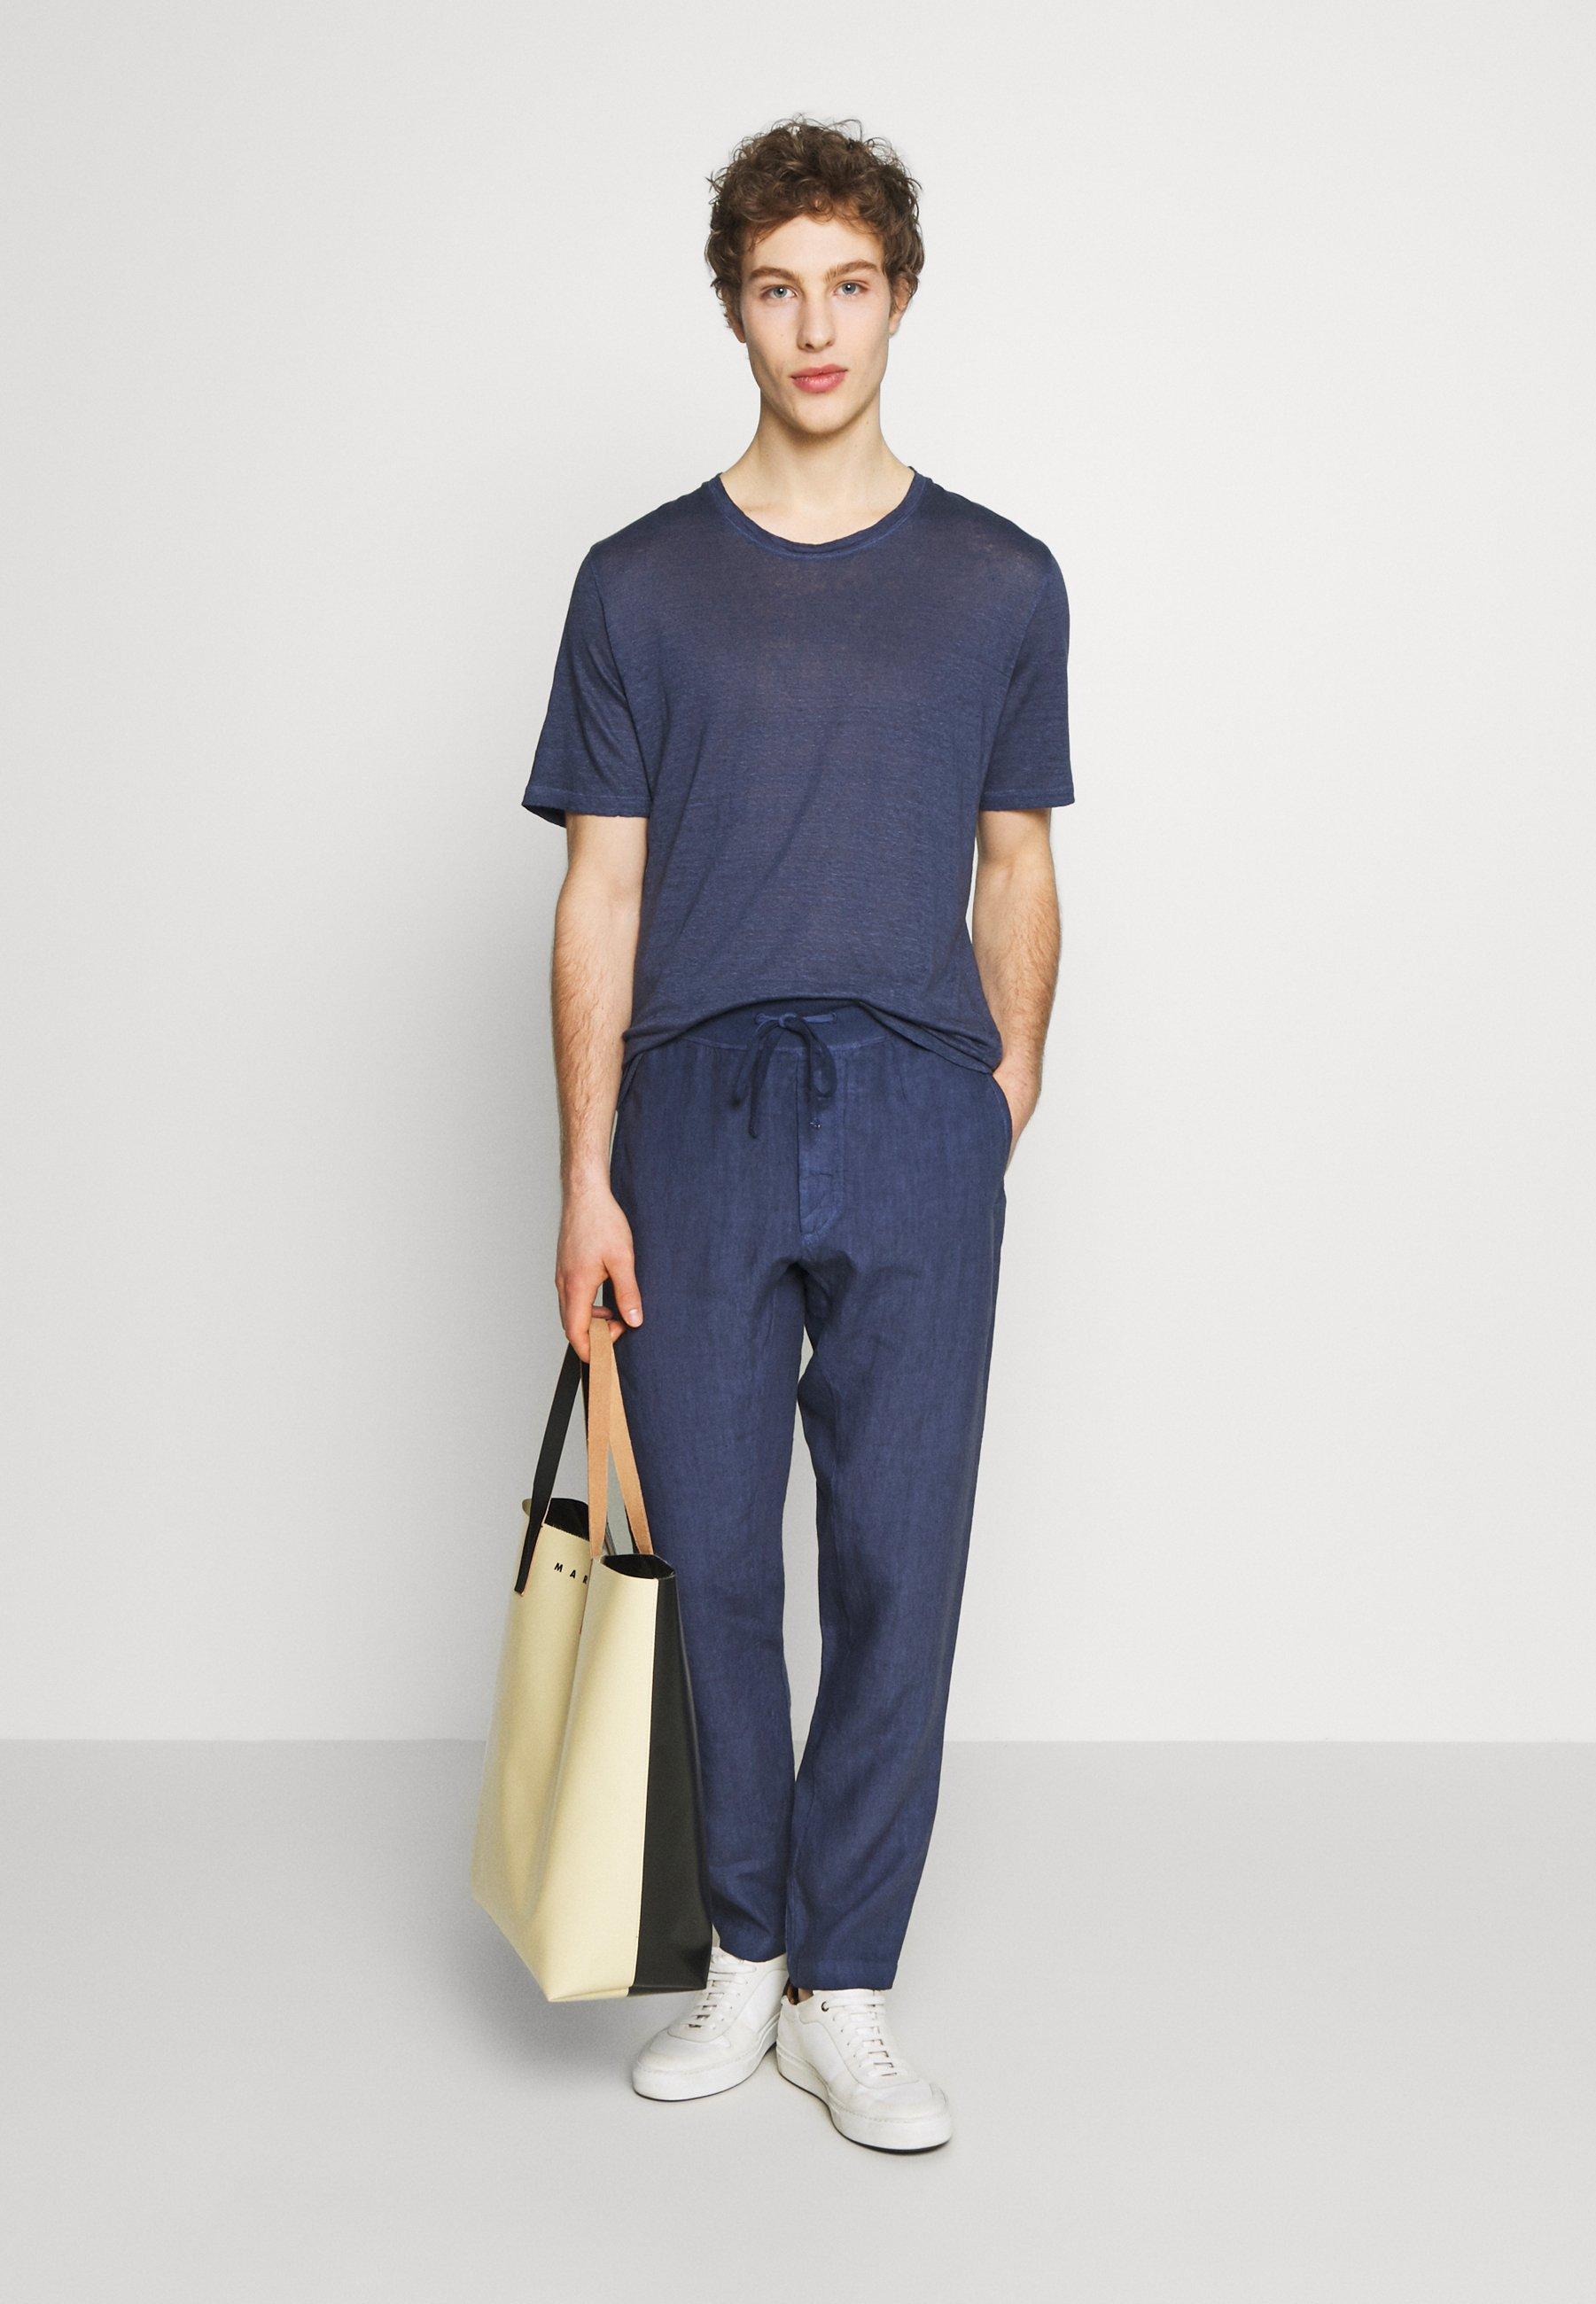 120% Lino Pantalon classique - dark blue fade